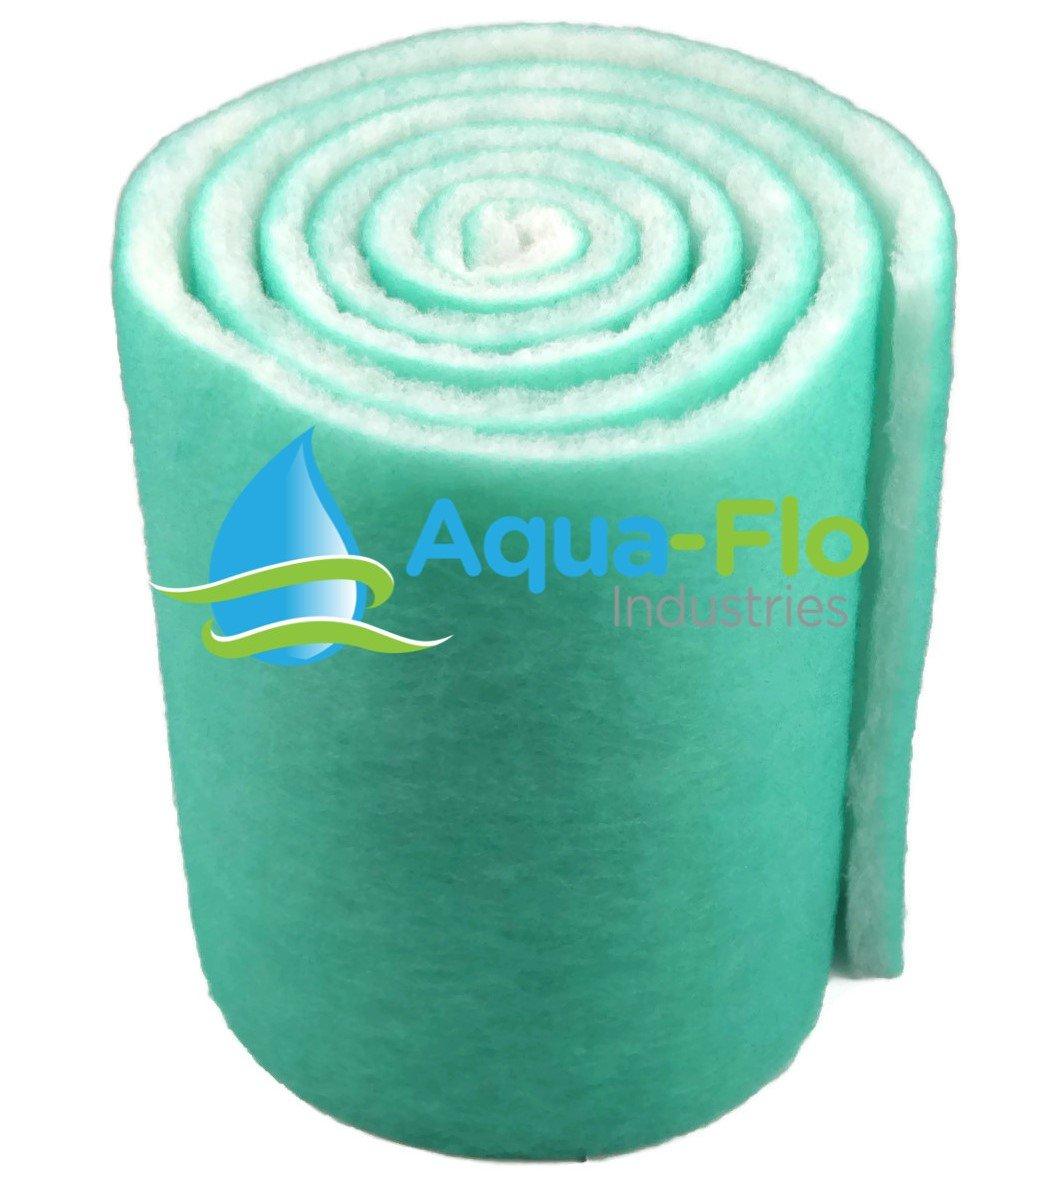 Aqua-Flo 18'' Pond & Aquarium Filter Media, 120'' (10 Feet) Long x 1'' Thick (Green/White)